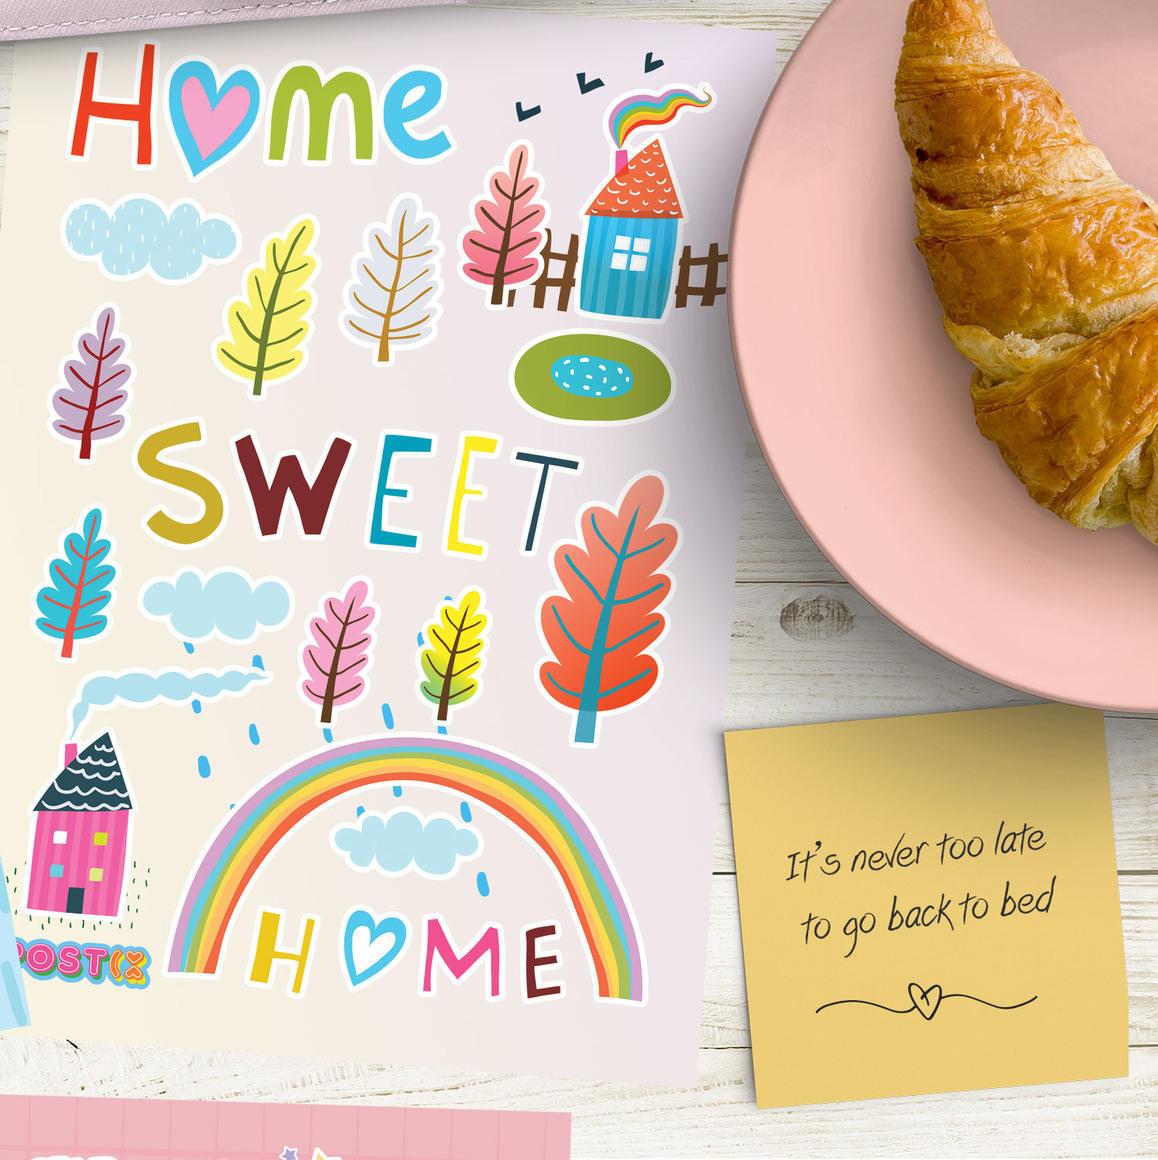 HOME SWEET HOME A6 GLOSSY STICKER SHEET   Trada Marketplace